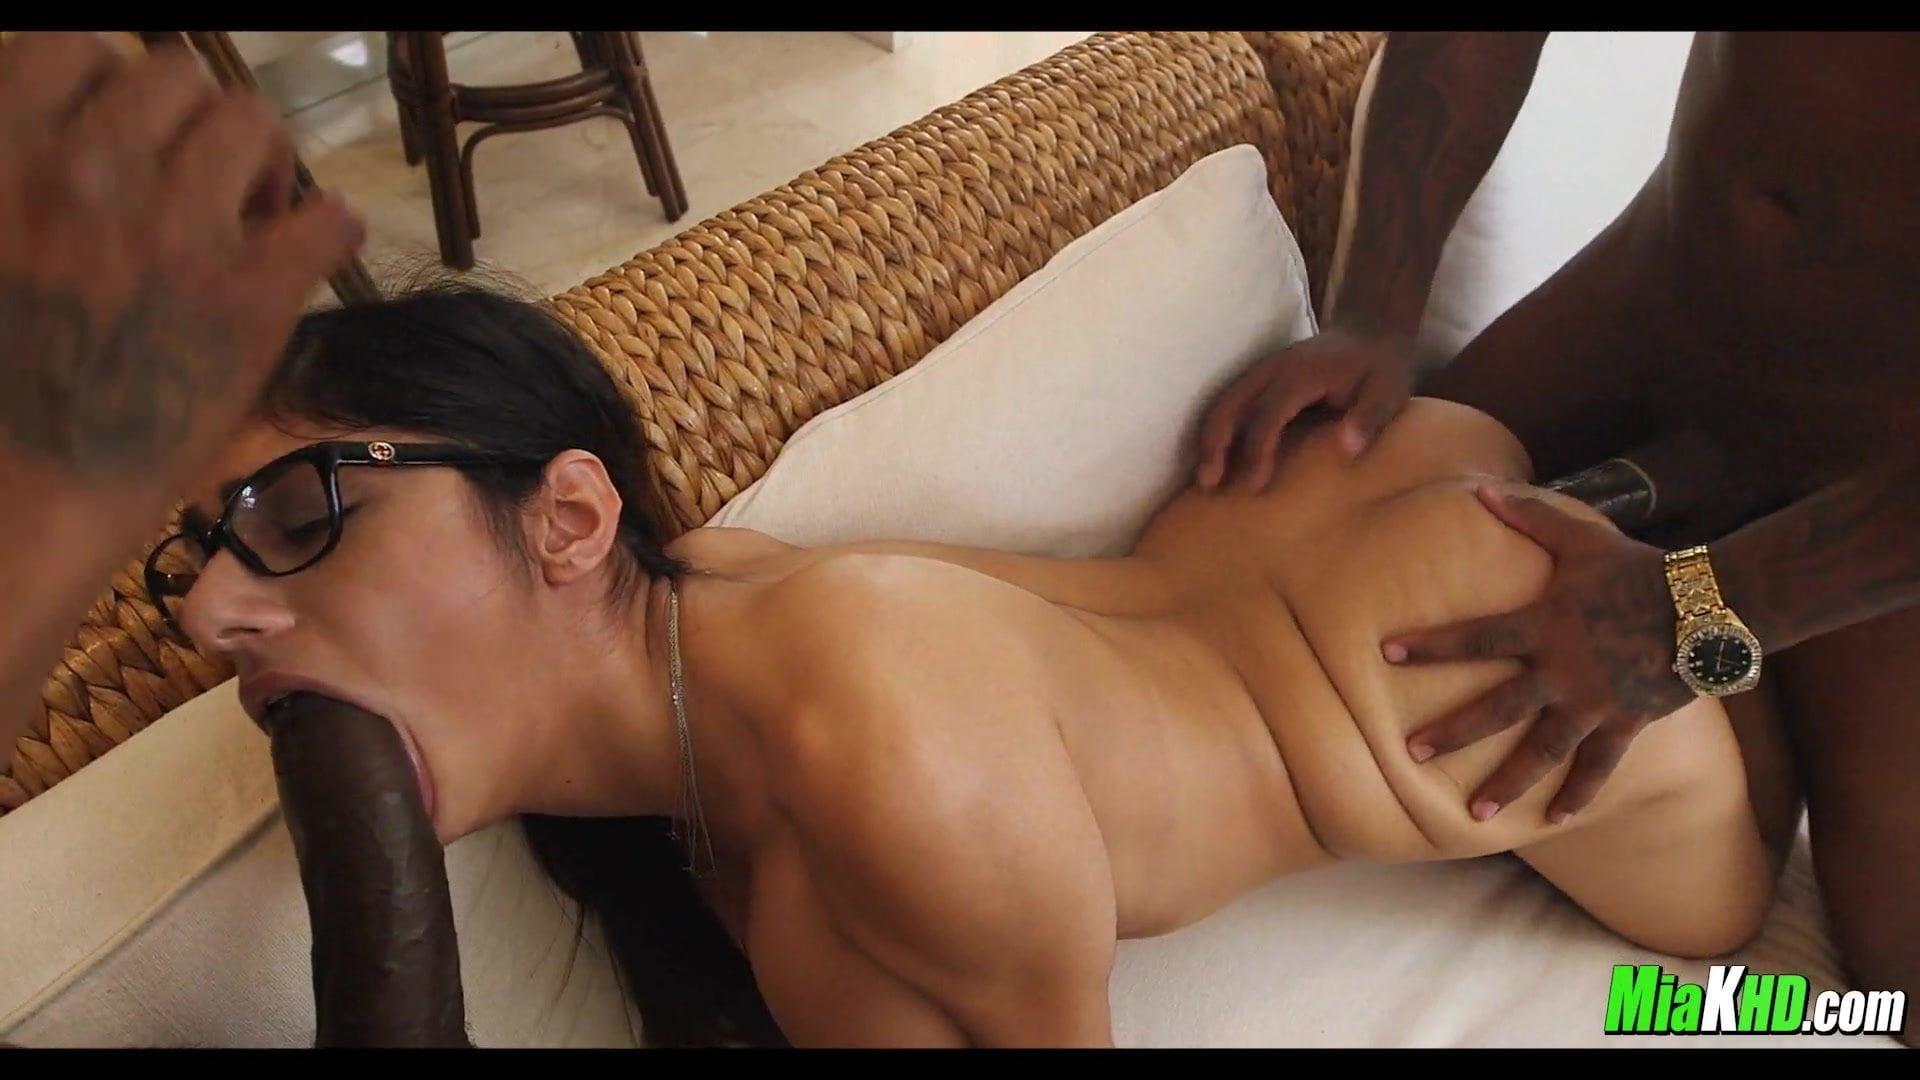 Nude chubby bbw porn